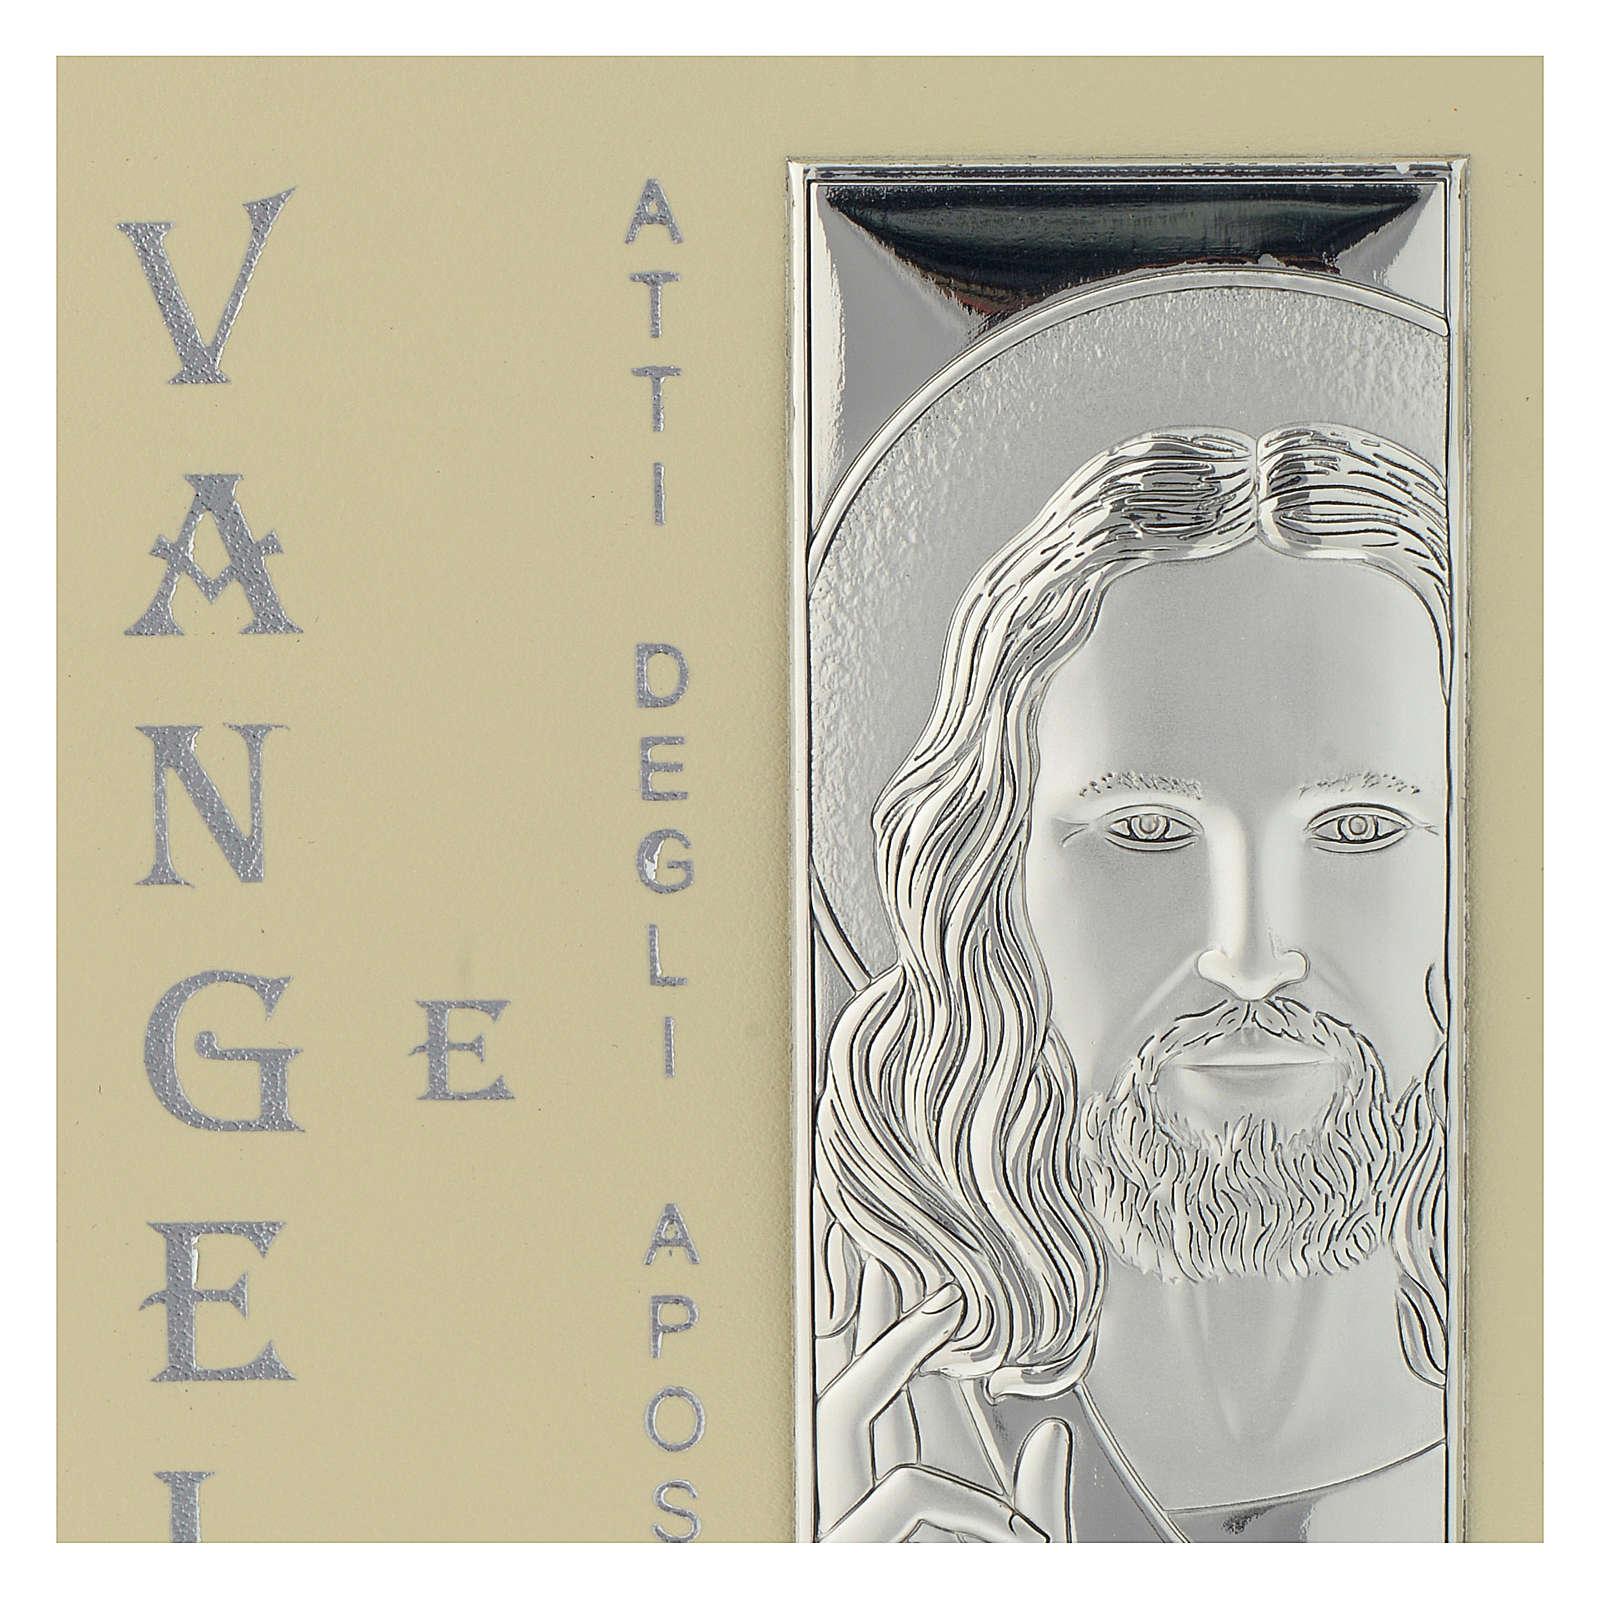 Evangelio simil cuero y placa Plata Bilaminada Rostro de Cristo 10x15 cm 3